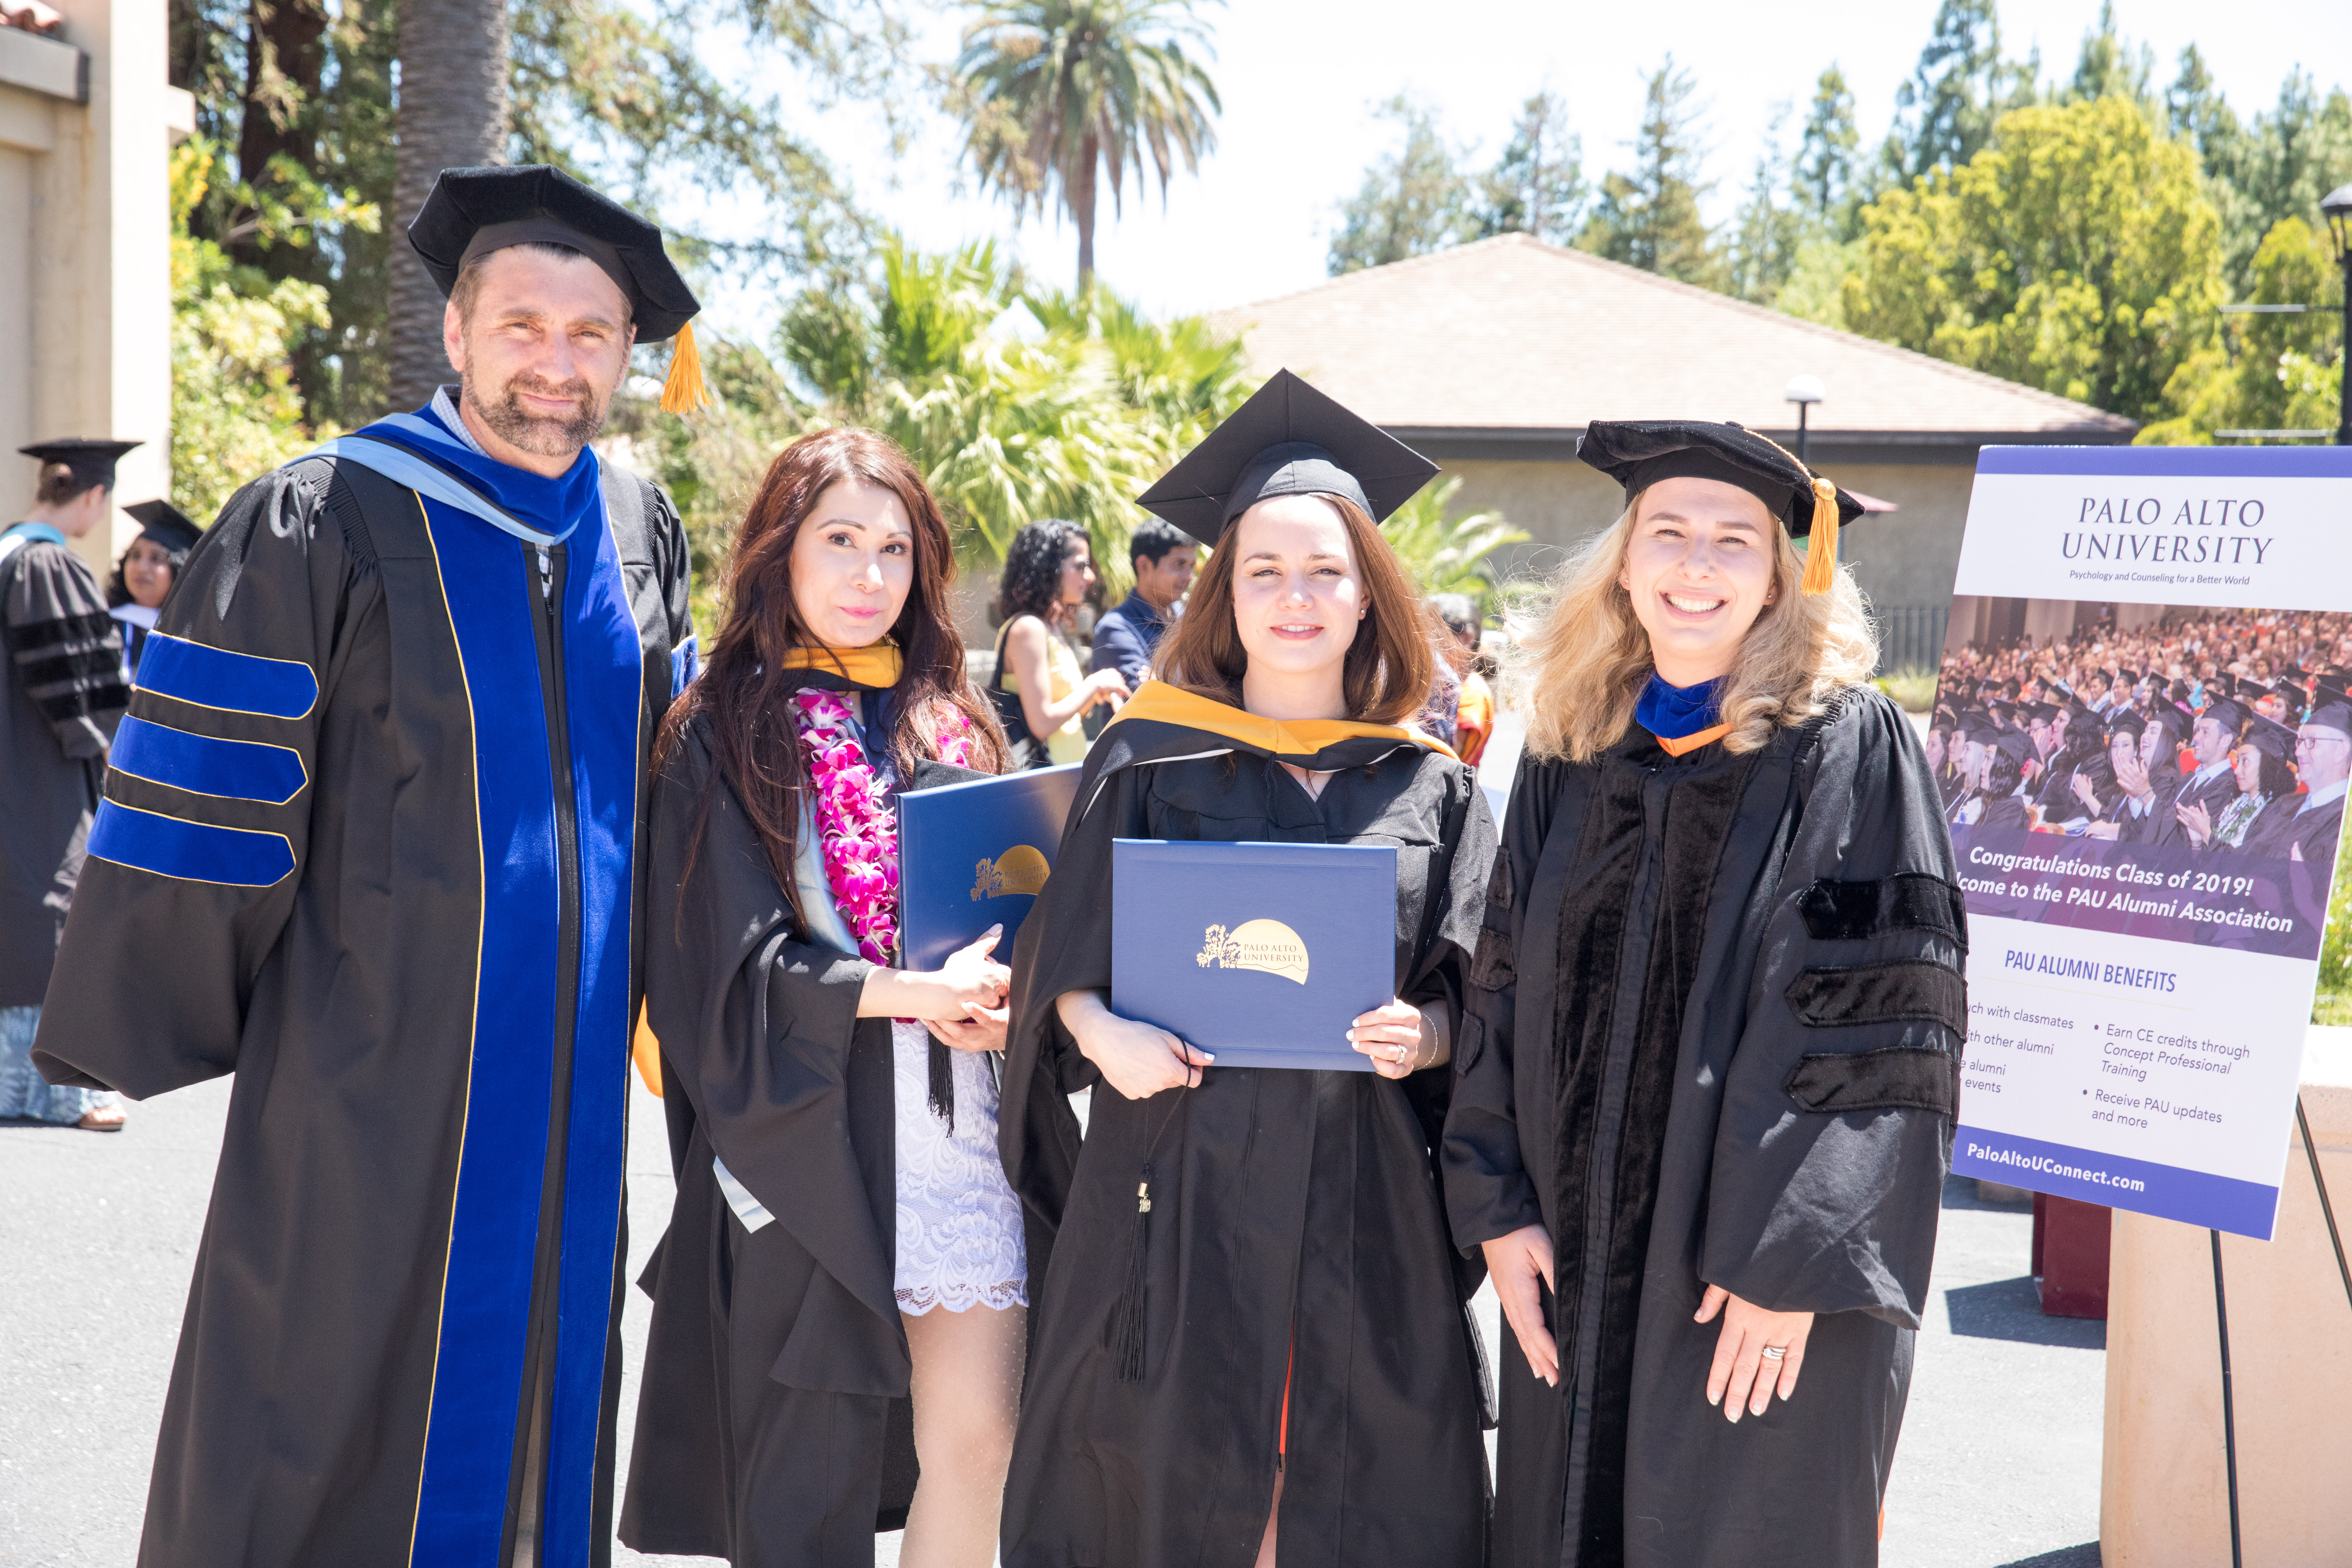 Students at Palo Alto University's 2019 graduation